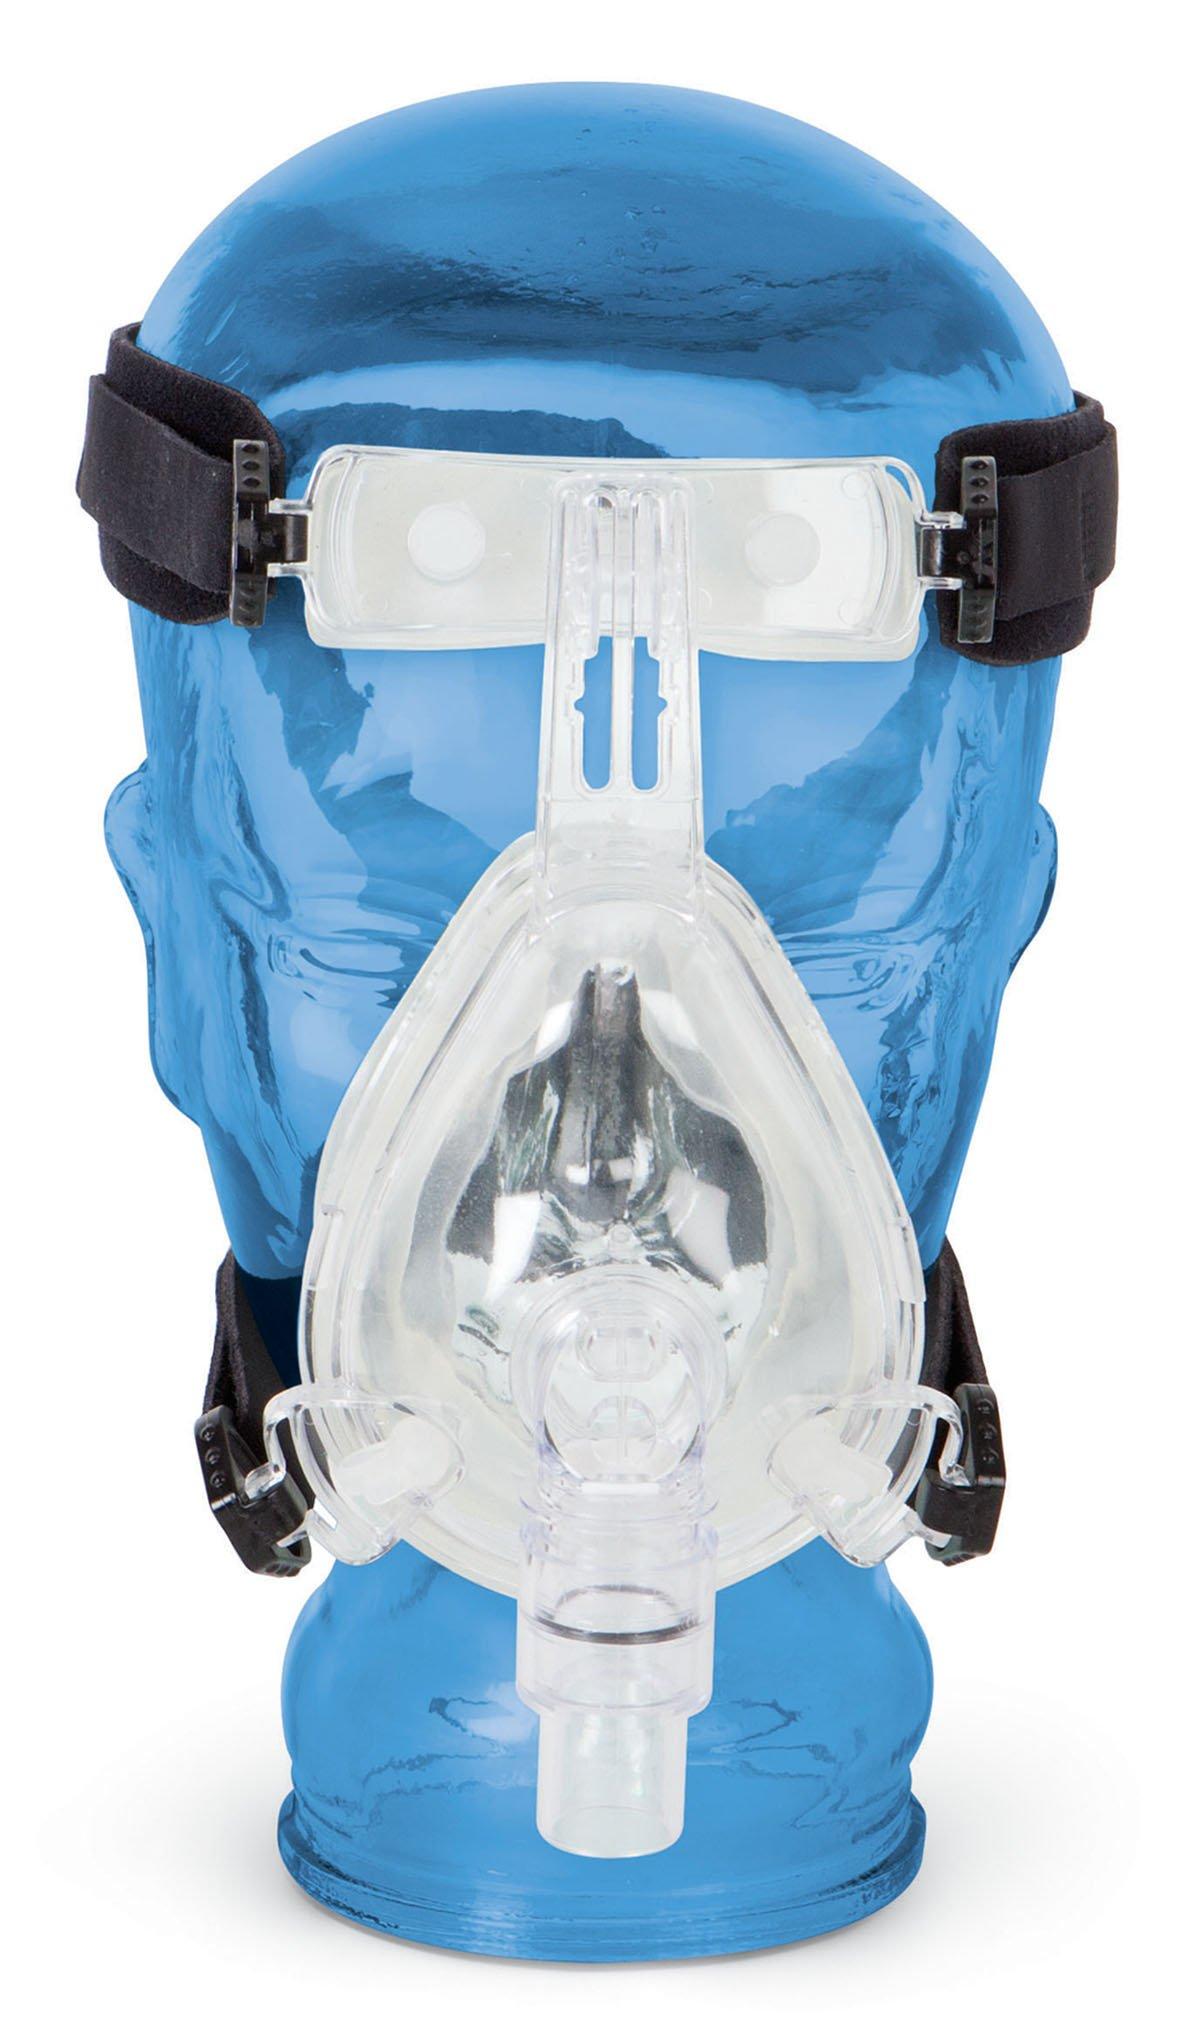 Medline CPAP9405 CPAP Face Mask, Adult Silentvent, Medium